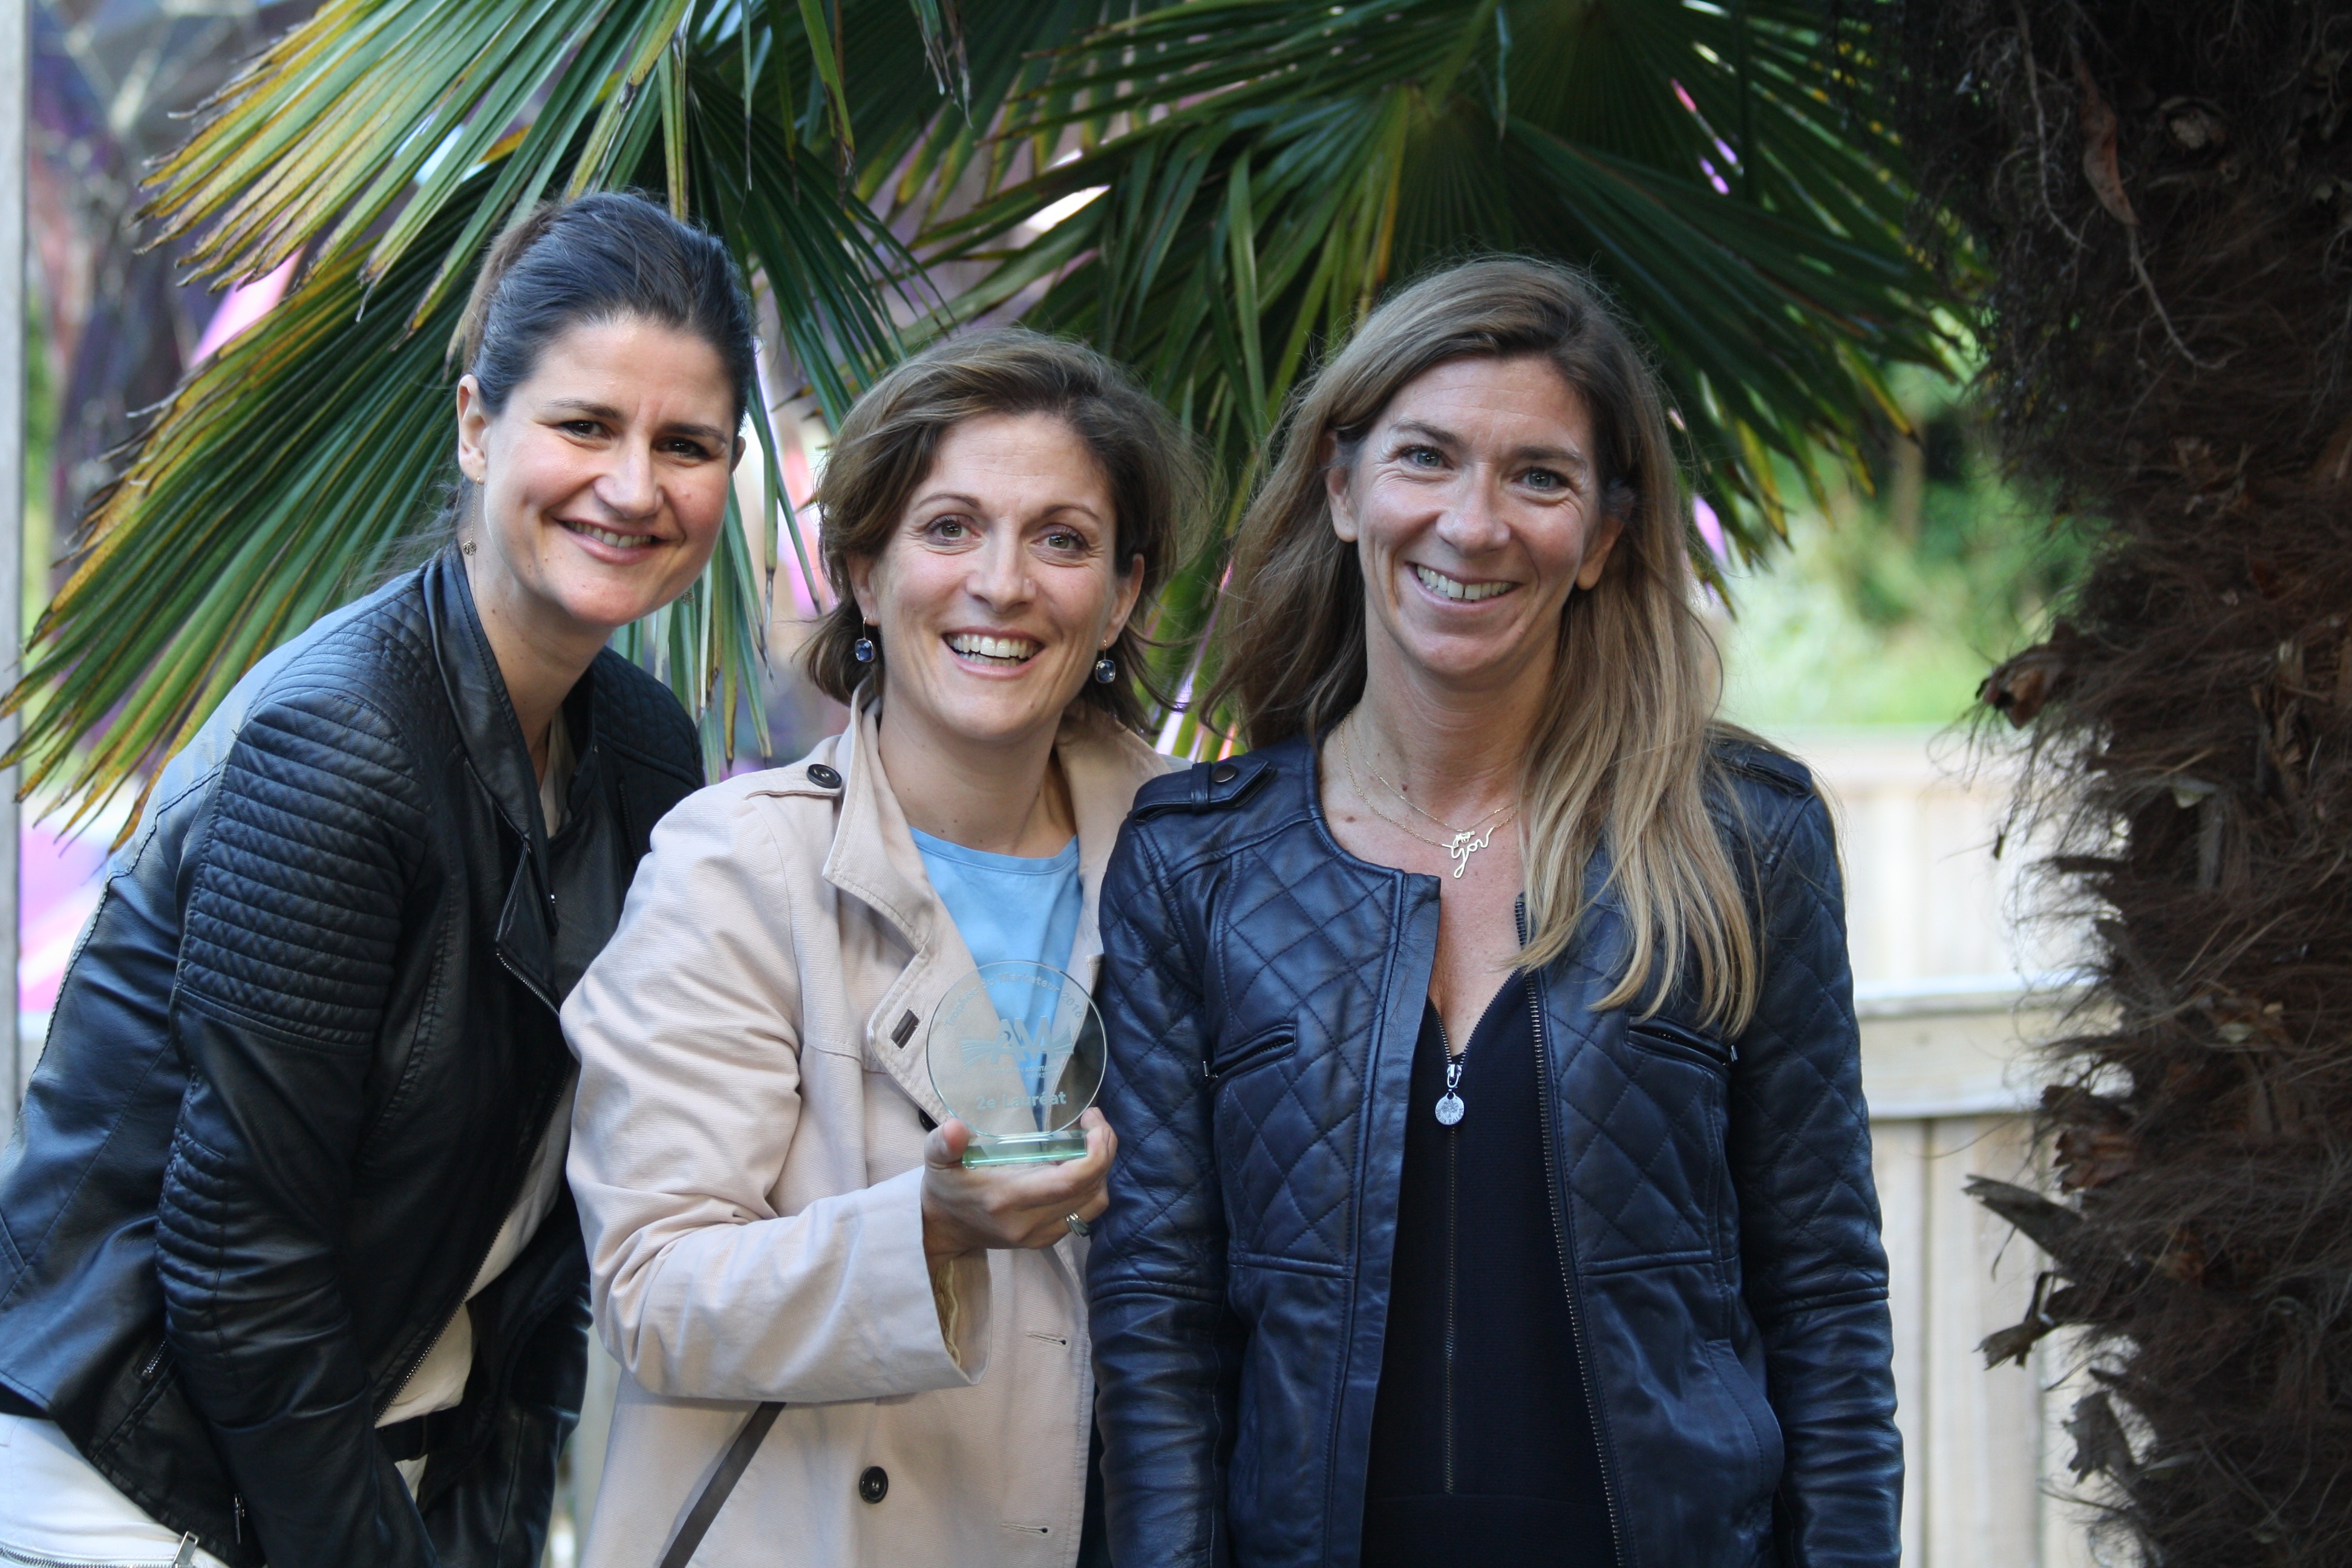 Stéphanie Chalard, Carine Porée et Elvire Nicolas, Beauty Sisters